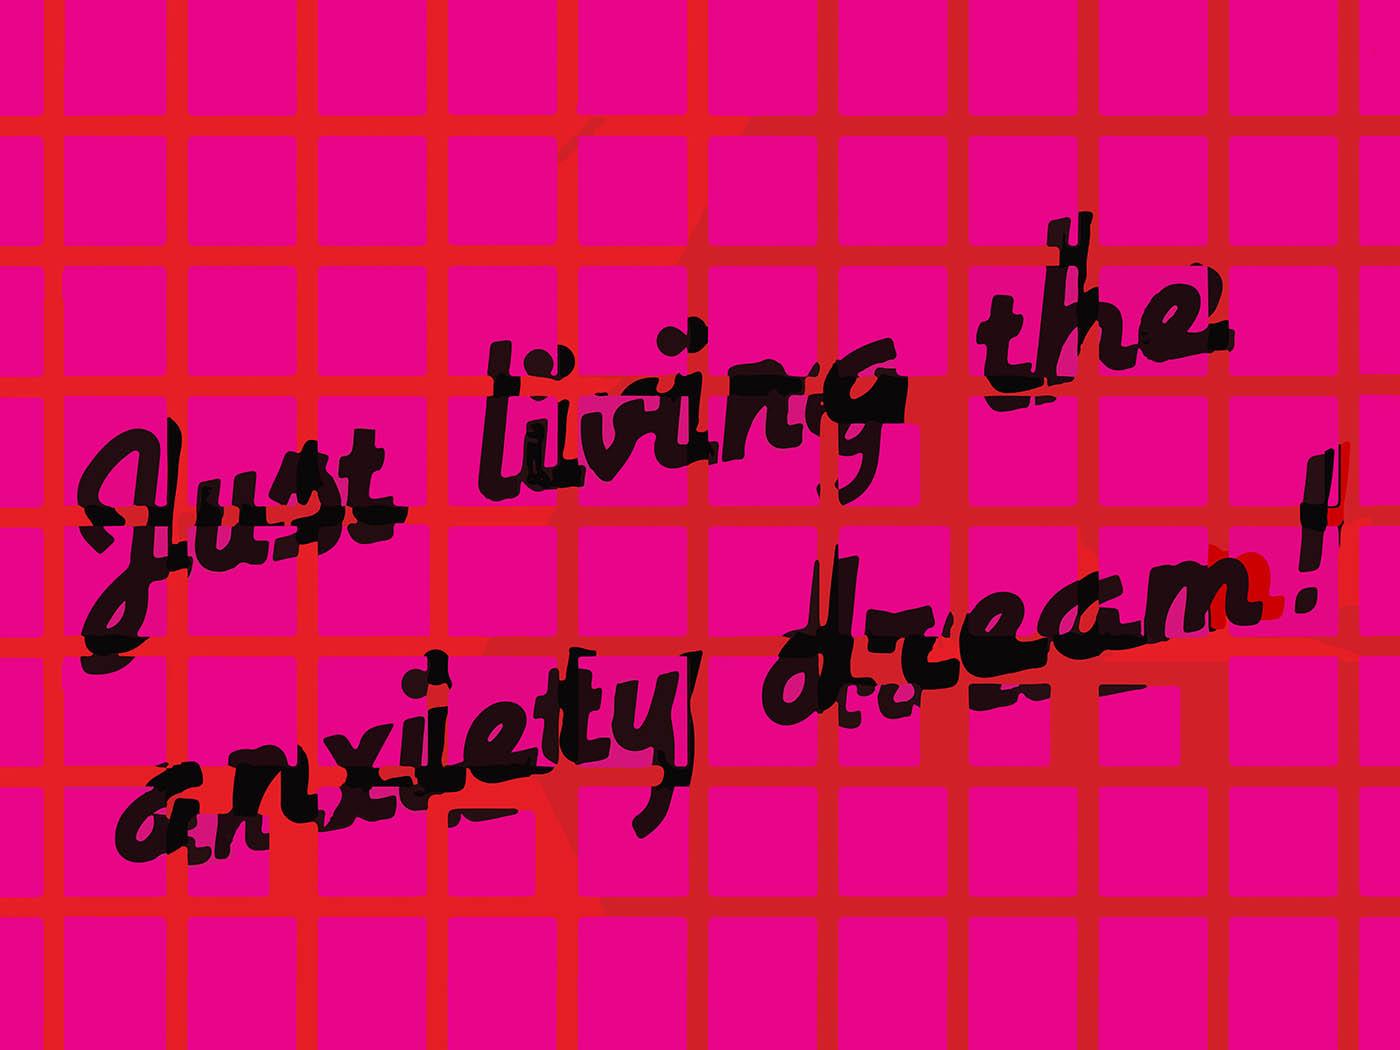 Allison Tanenhaus_Just Living The Anxiety Dream_sm_5.jpg